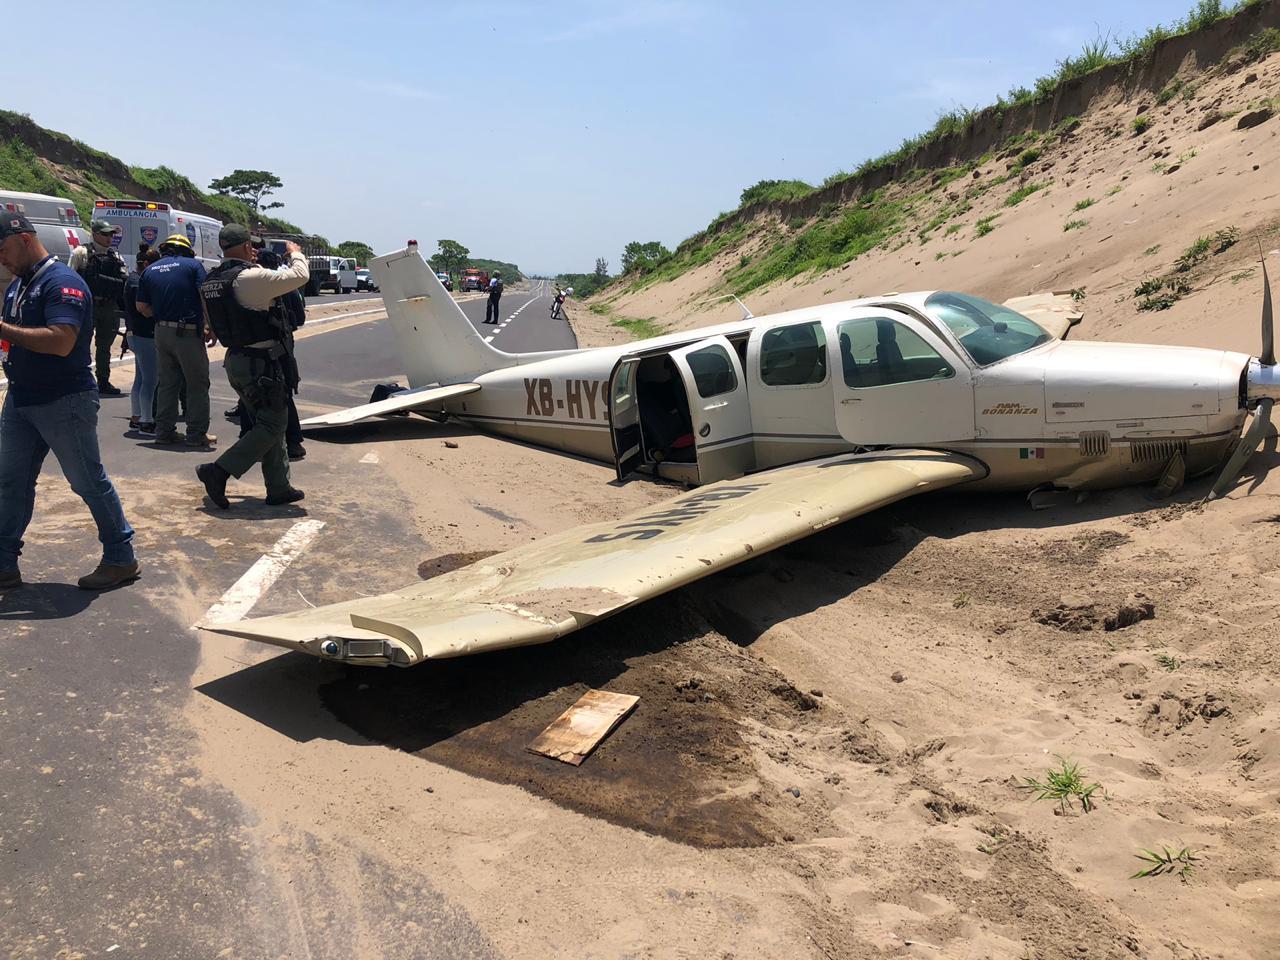 Aterriza de emergencia avioneta en carretera a Alvarado